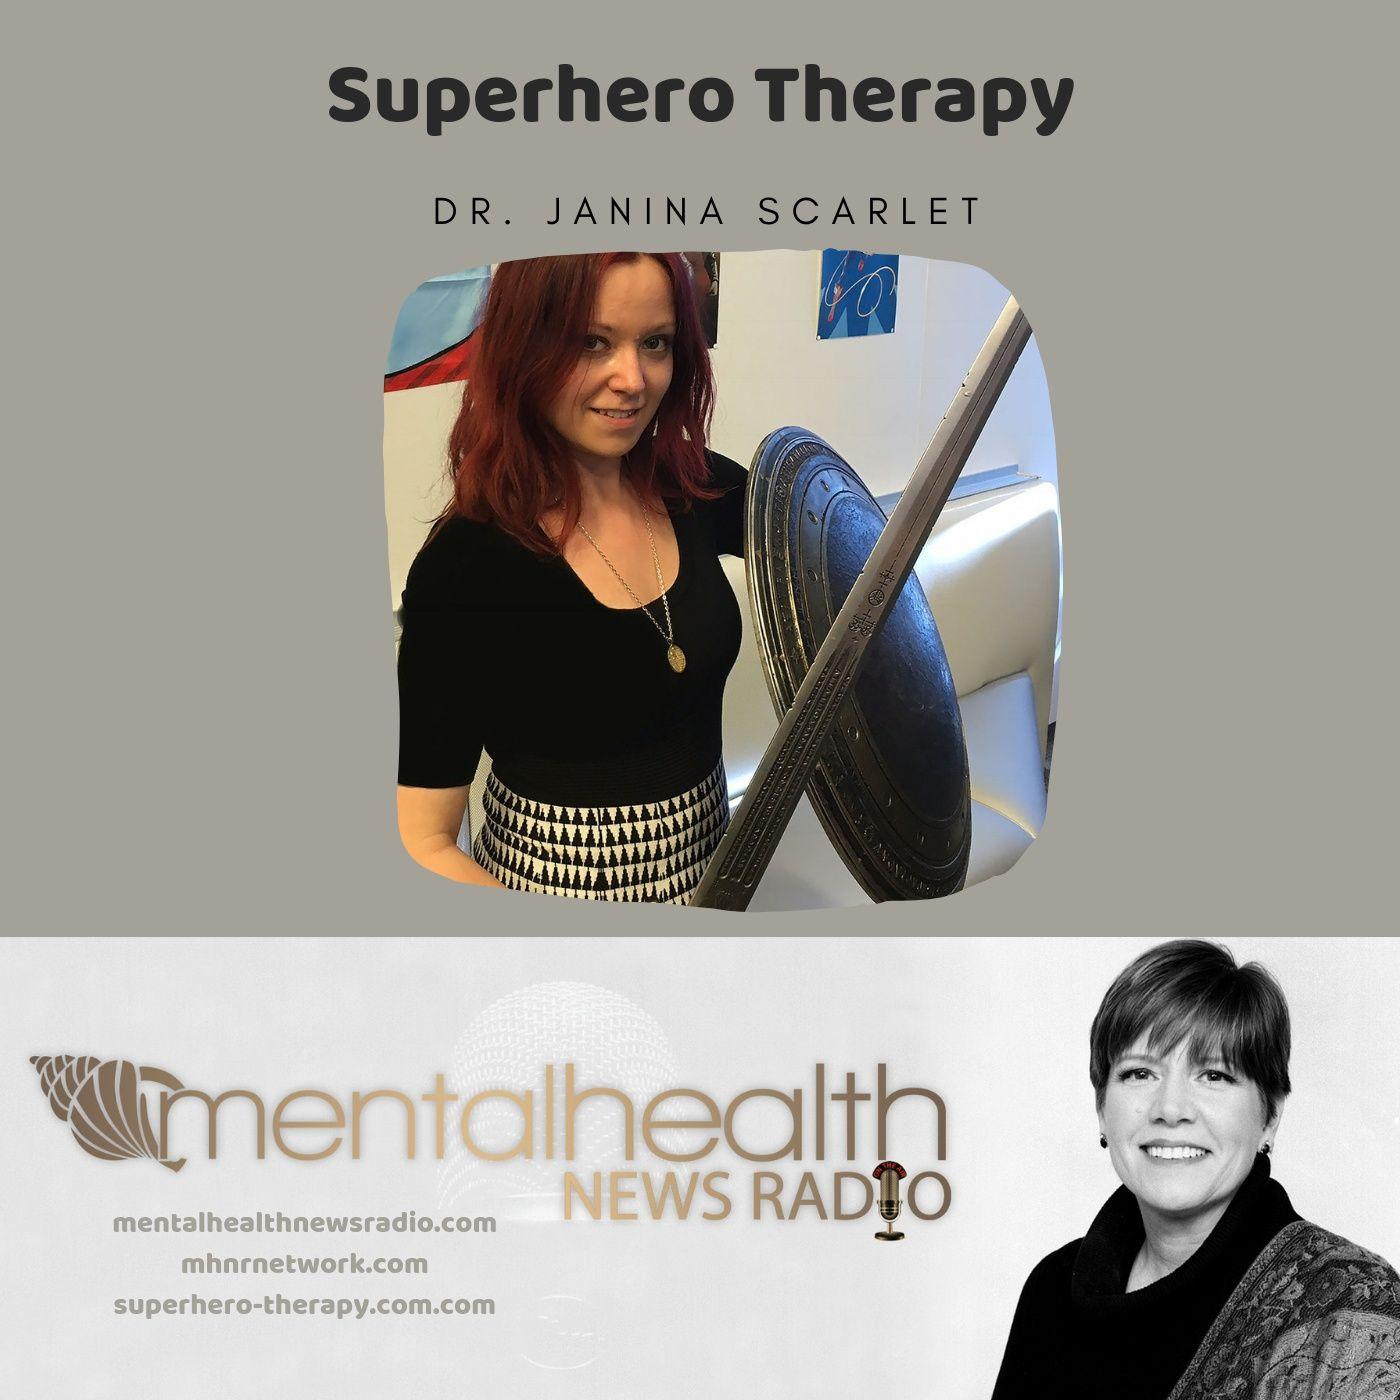 Mental Health News Radio - Superhero Therapy With Dr. Janina Scarlet